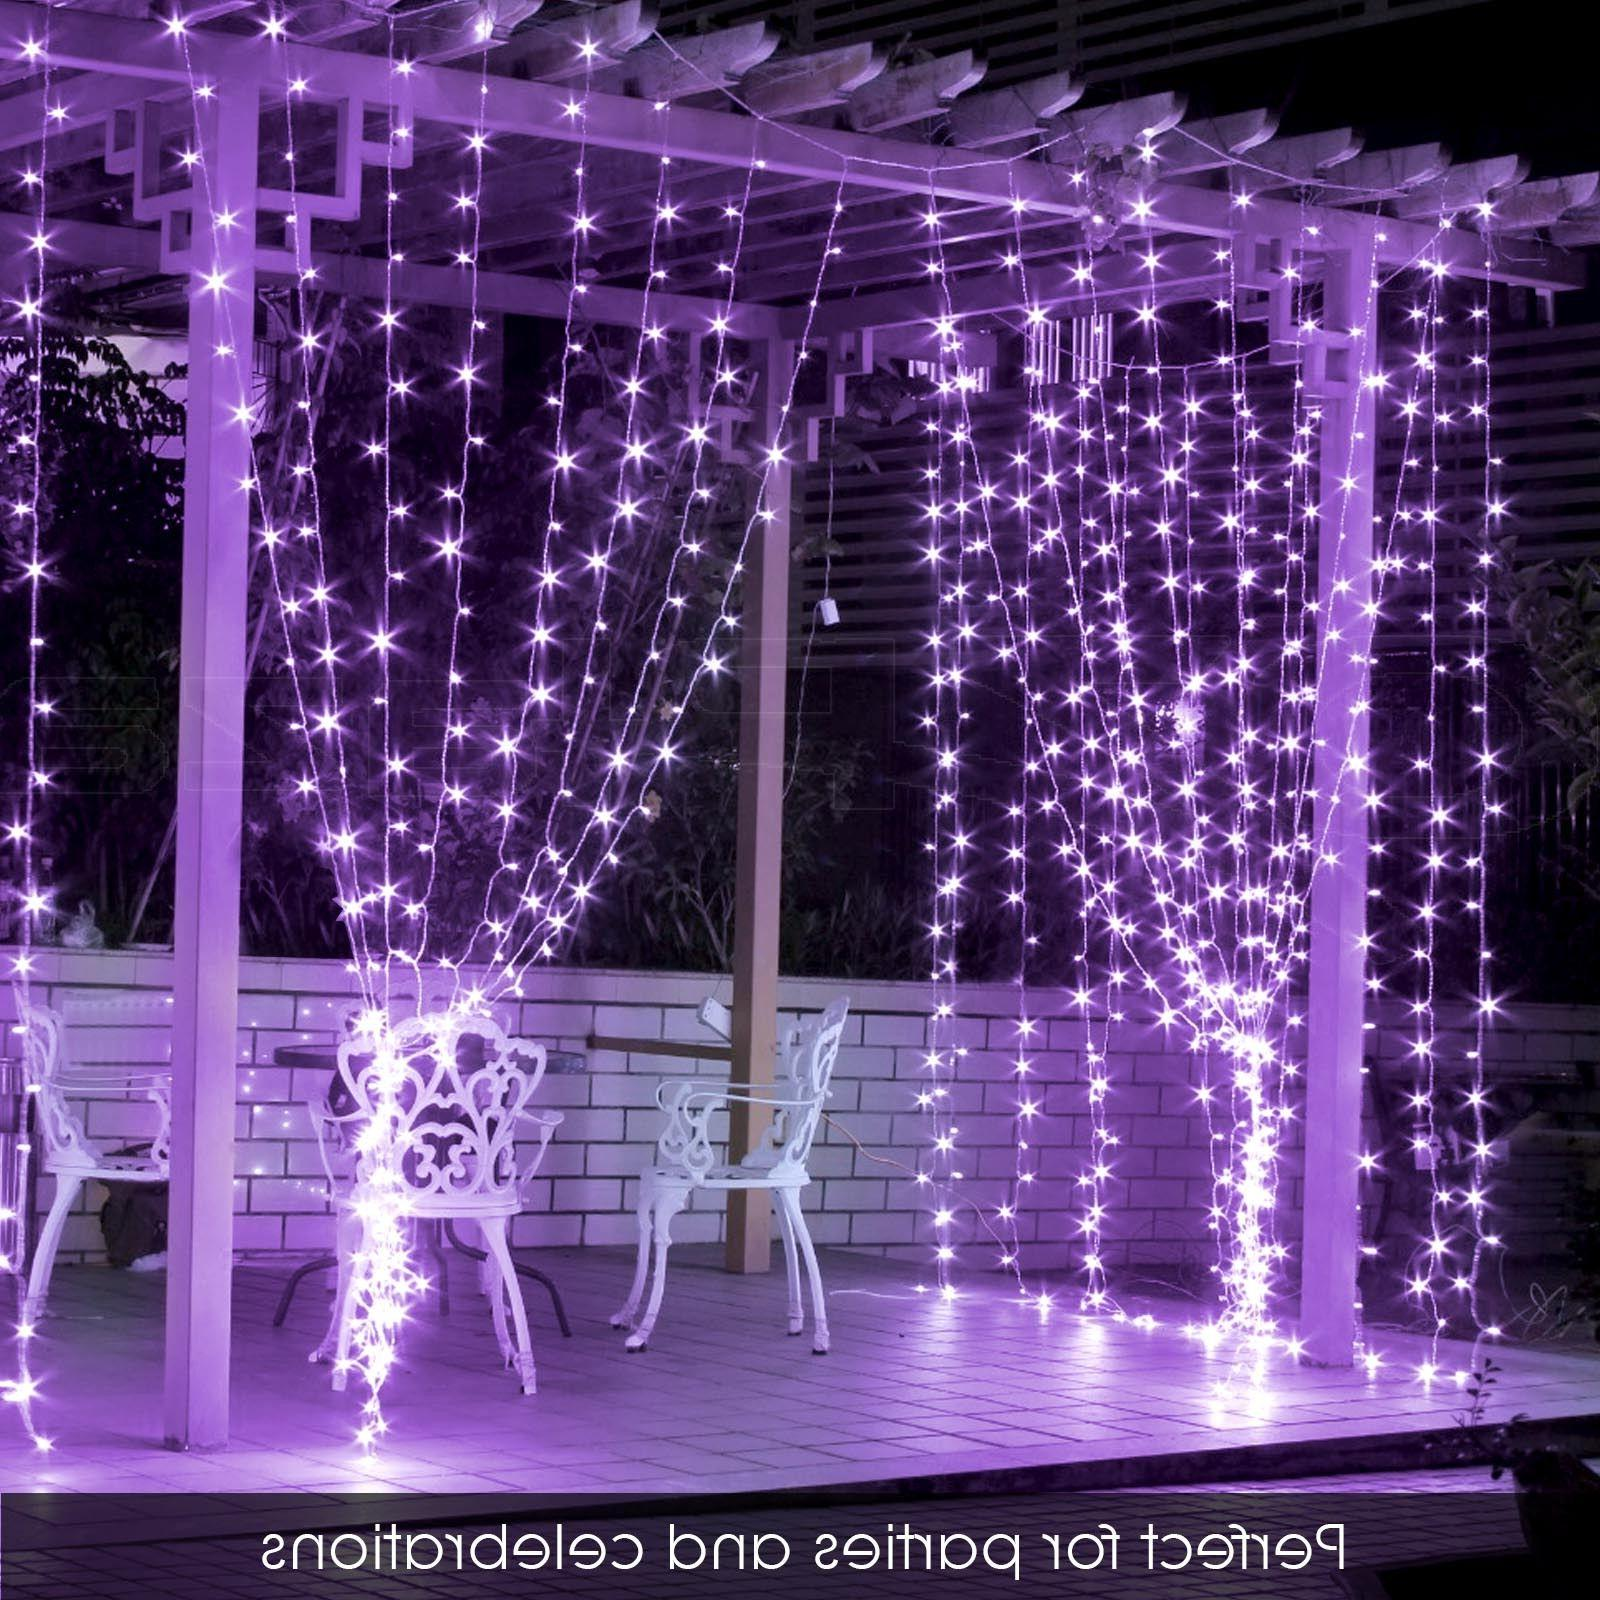 300 3m Curtain String Lights Wedding Perfect Purple